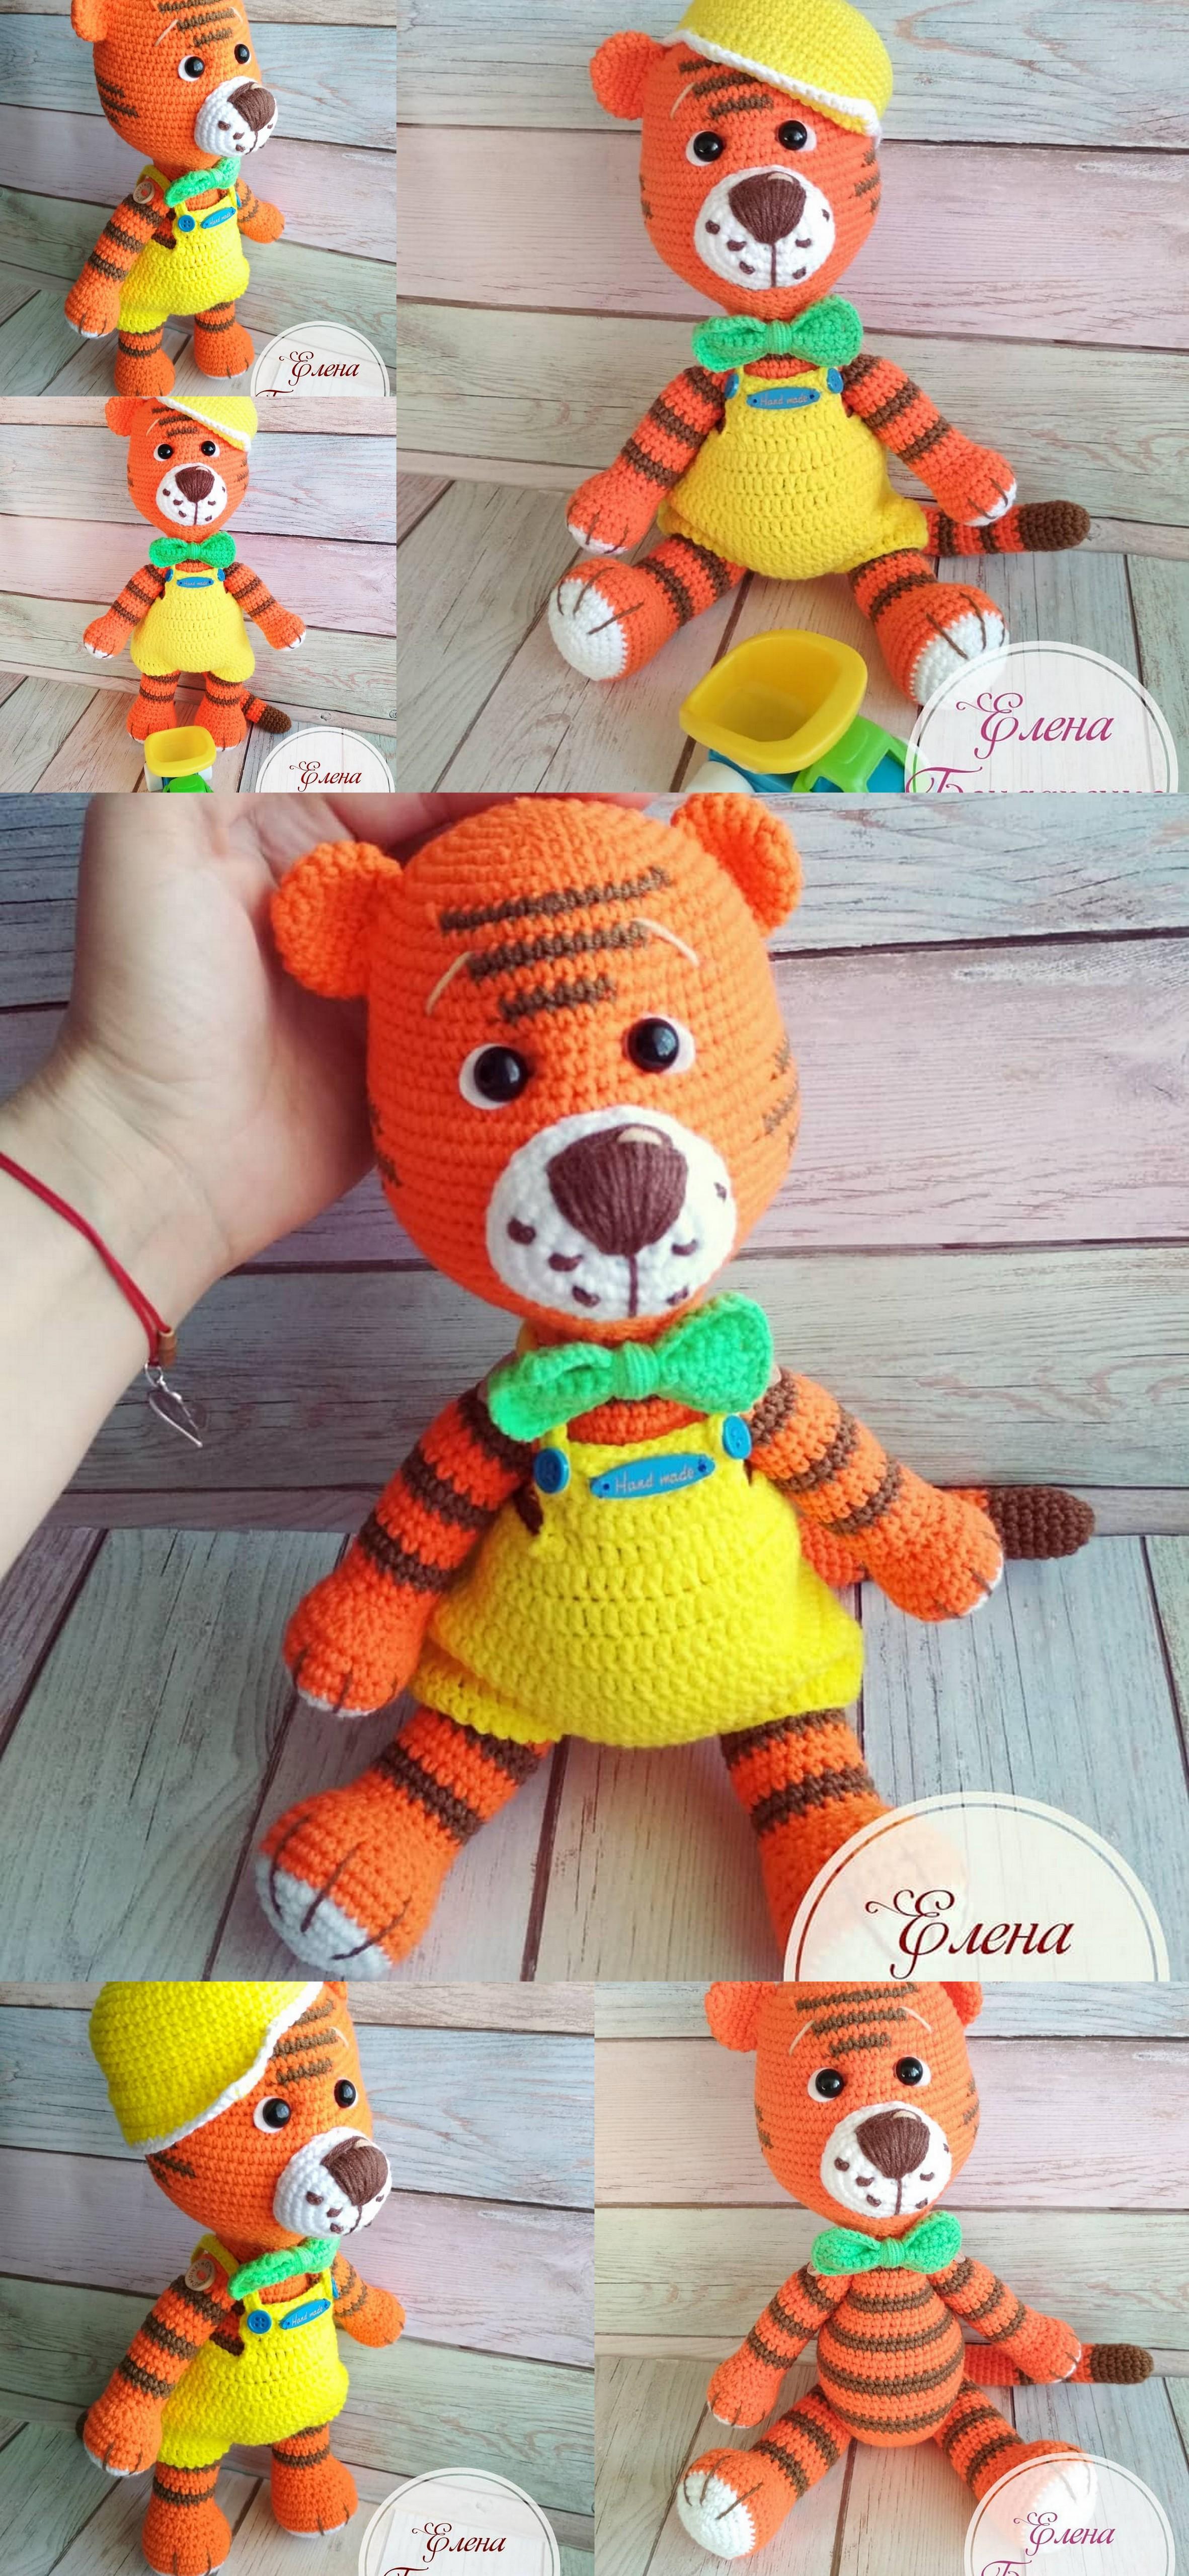 All Amigurumi Crochet Doll and Animal Patterns